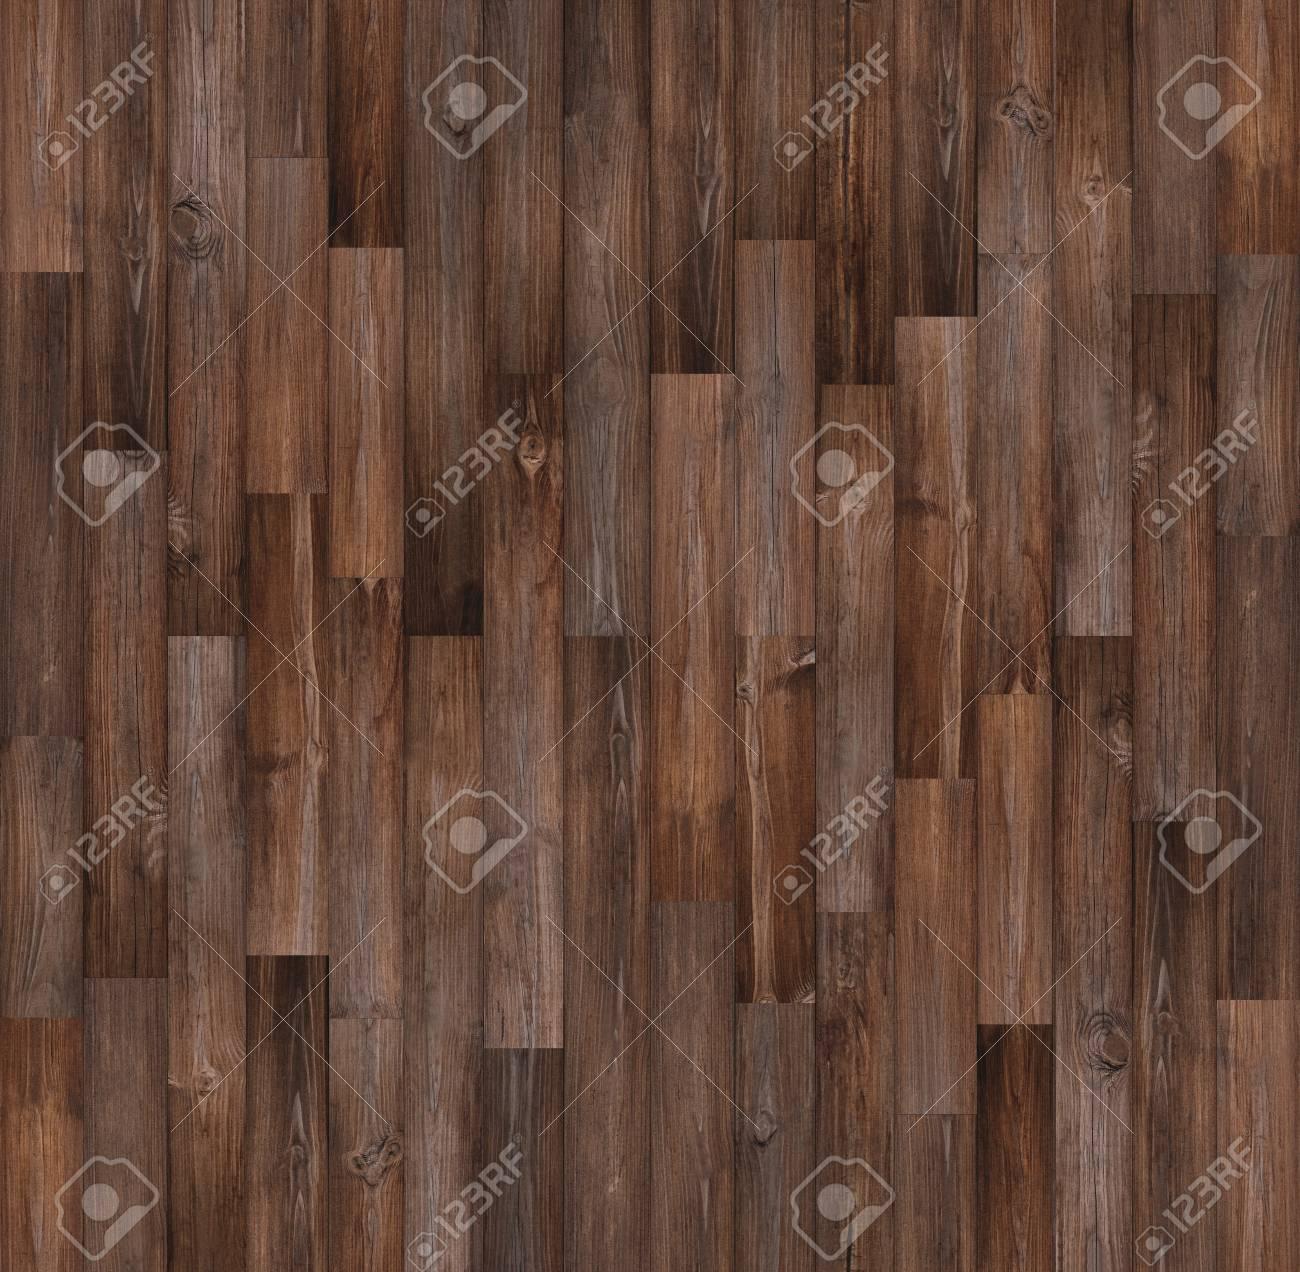 seamless wood floor texture. Dark Wood Floor Texture Background, Seamless Stock Photo - 91306298